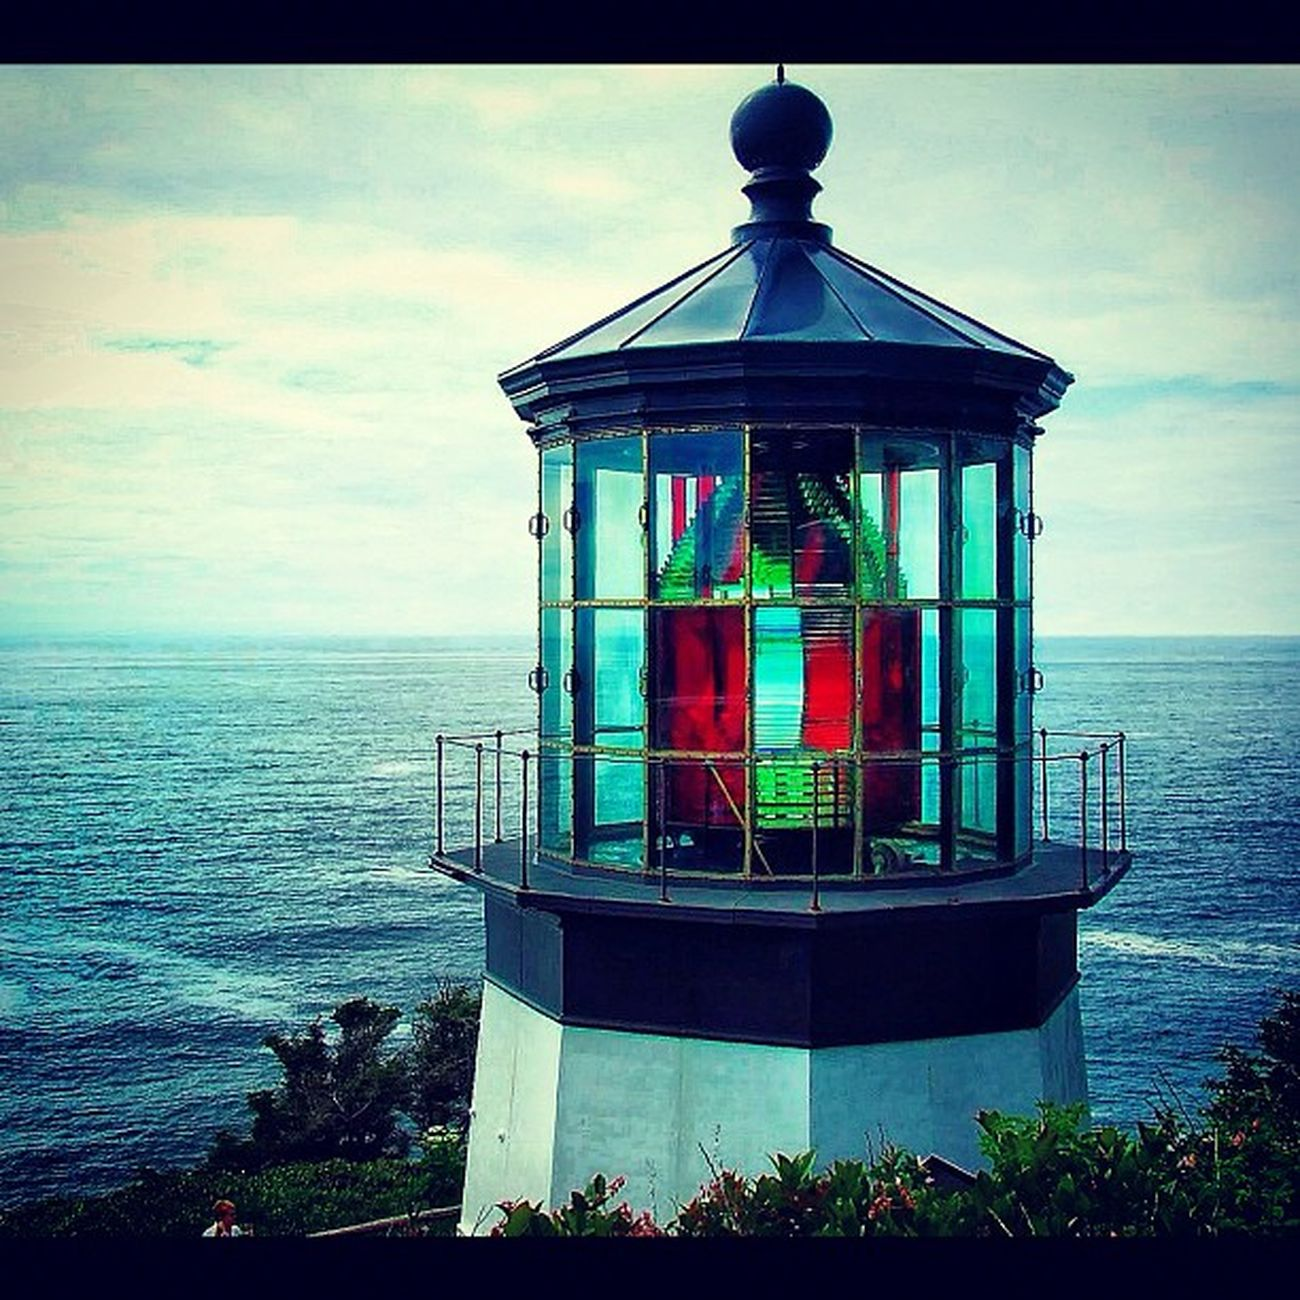 Cape Meares Lighthouse #oregon #oregoncoast #lighthouse #ocean #sea #coast #outdoors #travel #honktravel Sea Travel Lighthouse Outdoors Ocean Coast Oregon Honktravel Oregoncoast